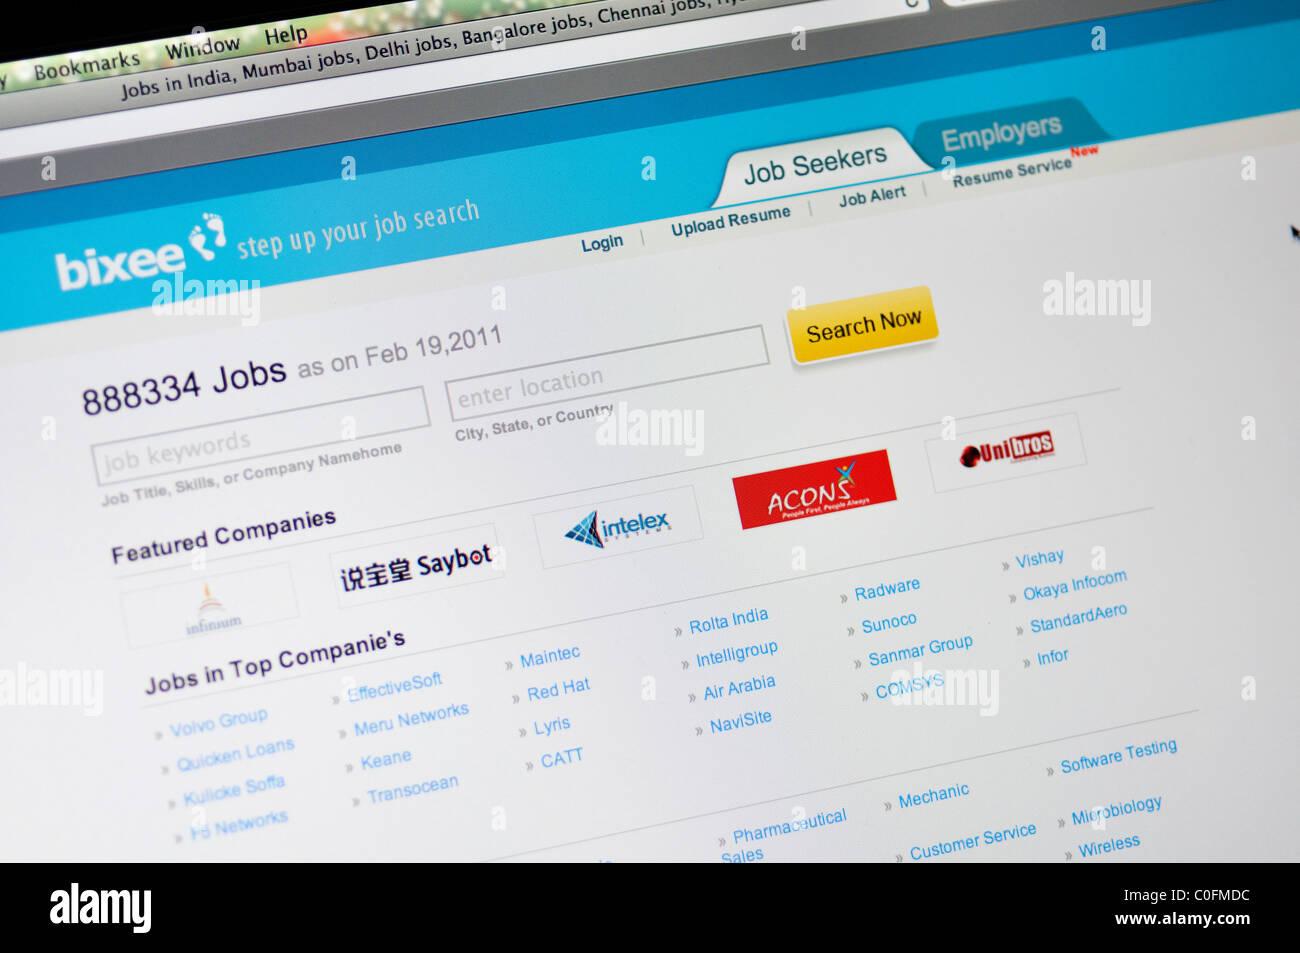 Job Listings Imágenes De Stock & Job Listings Fotos De Stock - Alamy